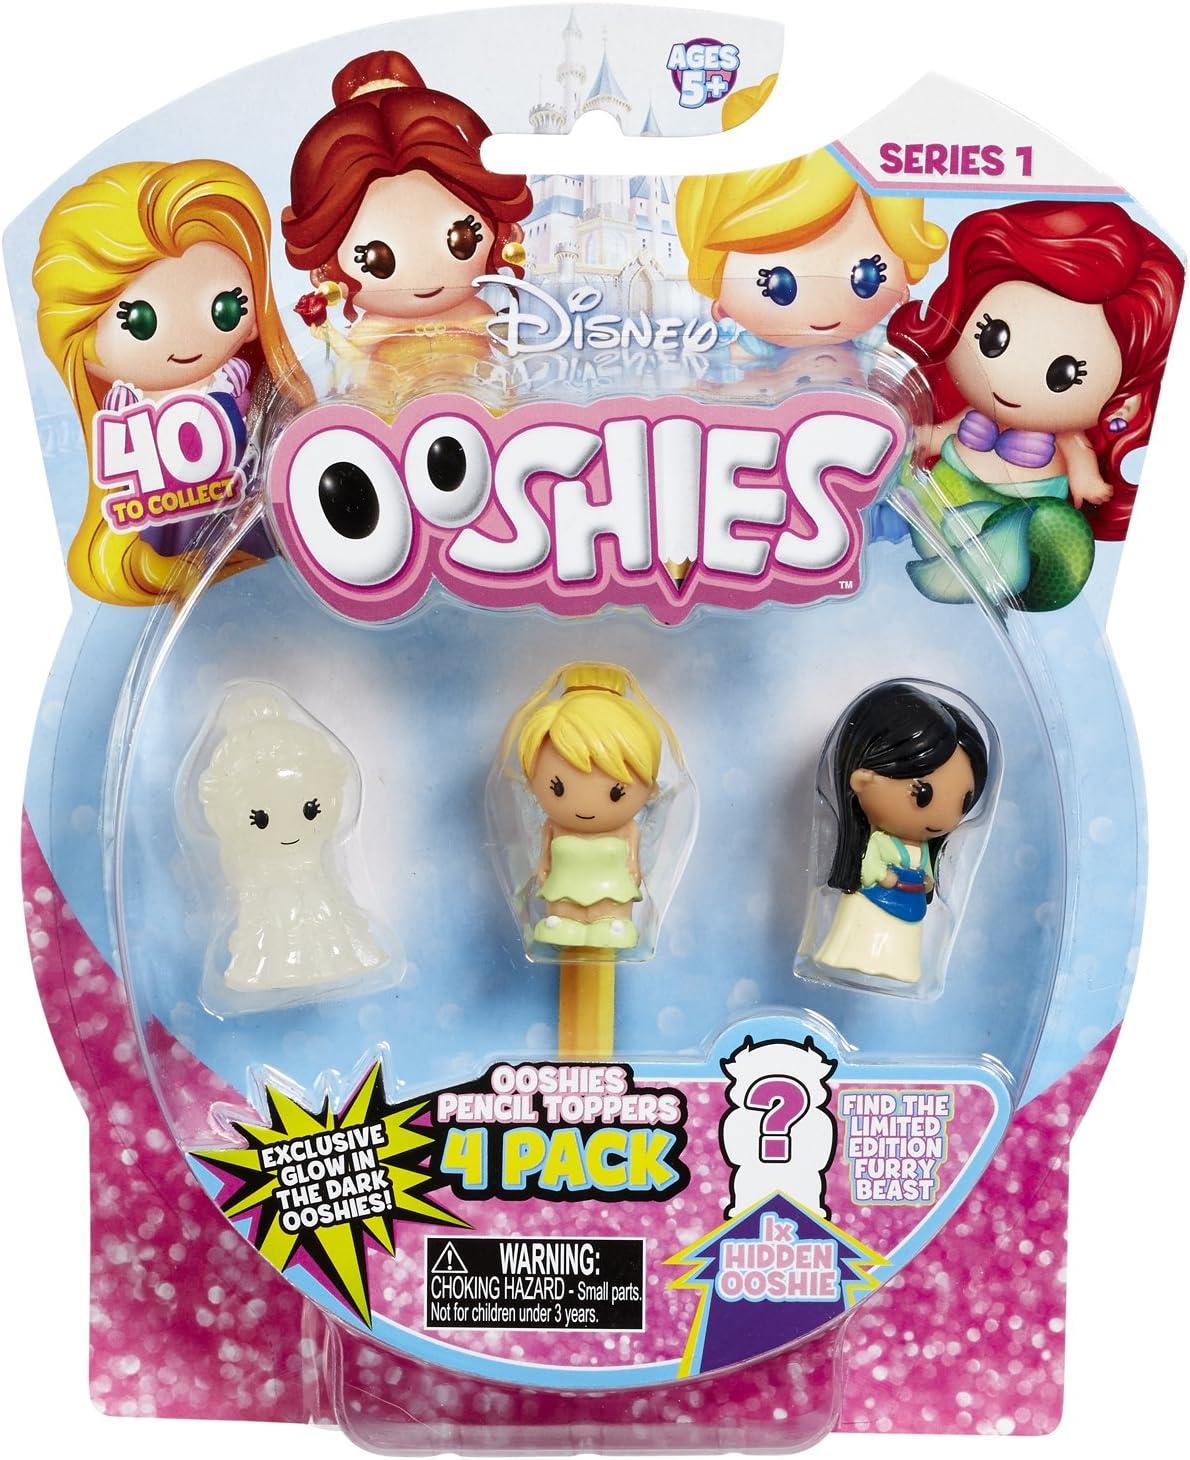 Ariel Disney Princess Series One Ooshies